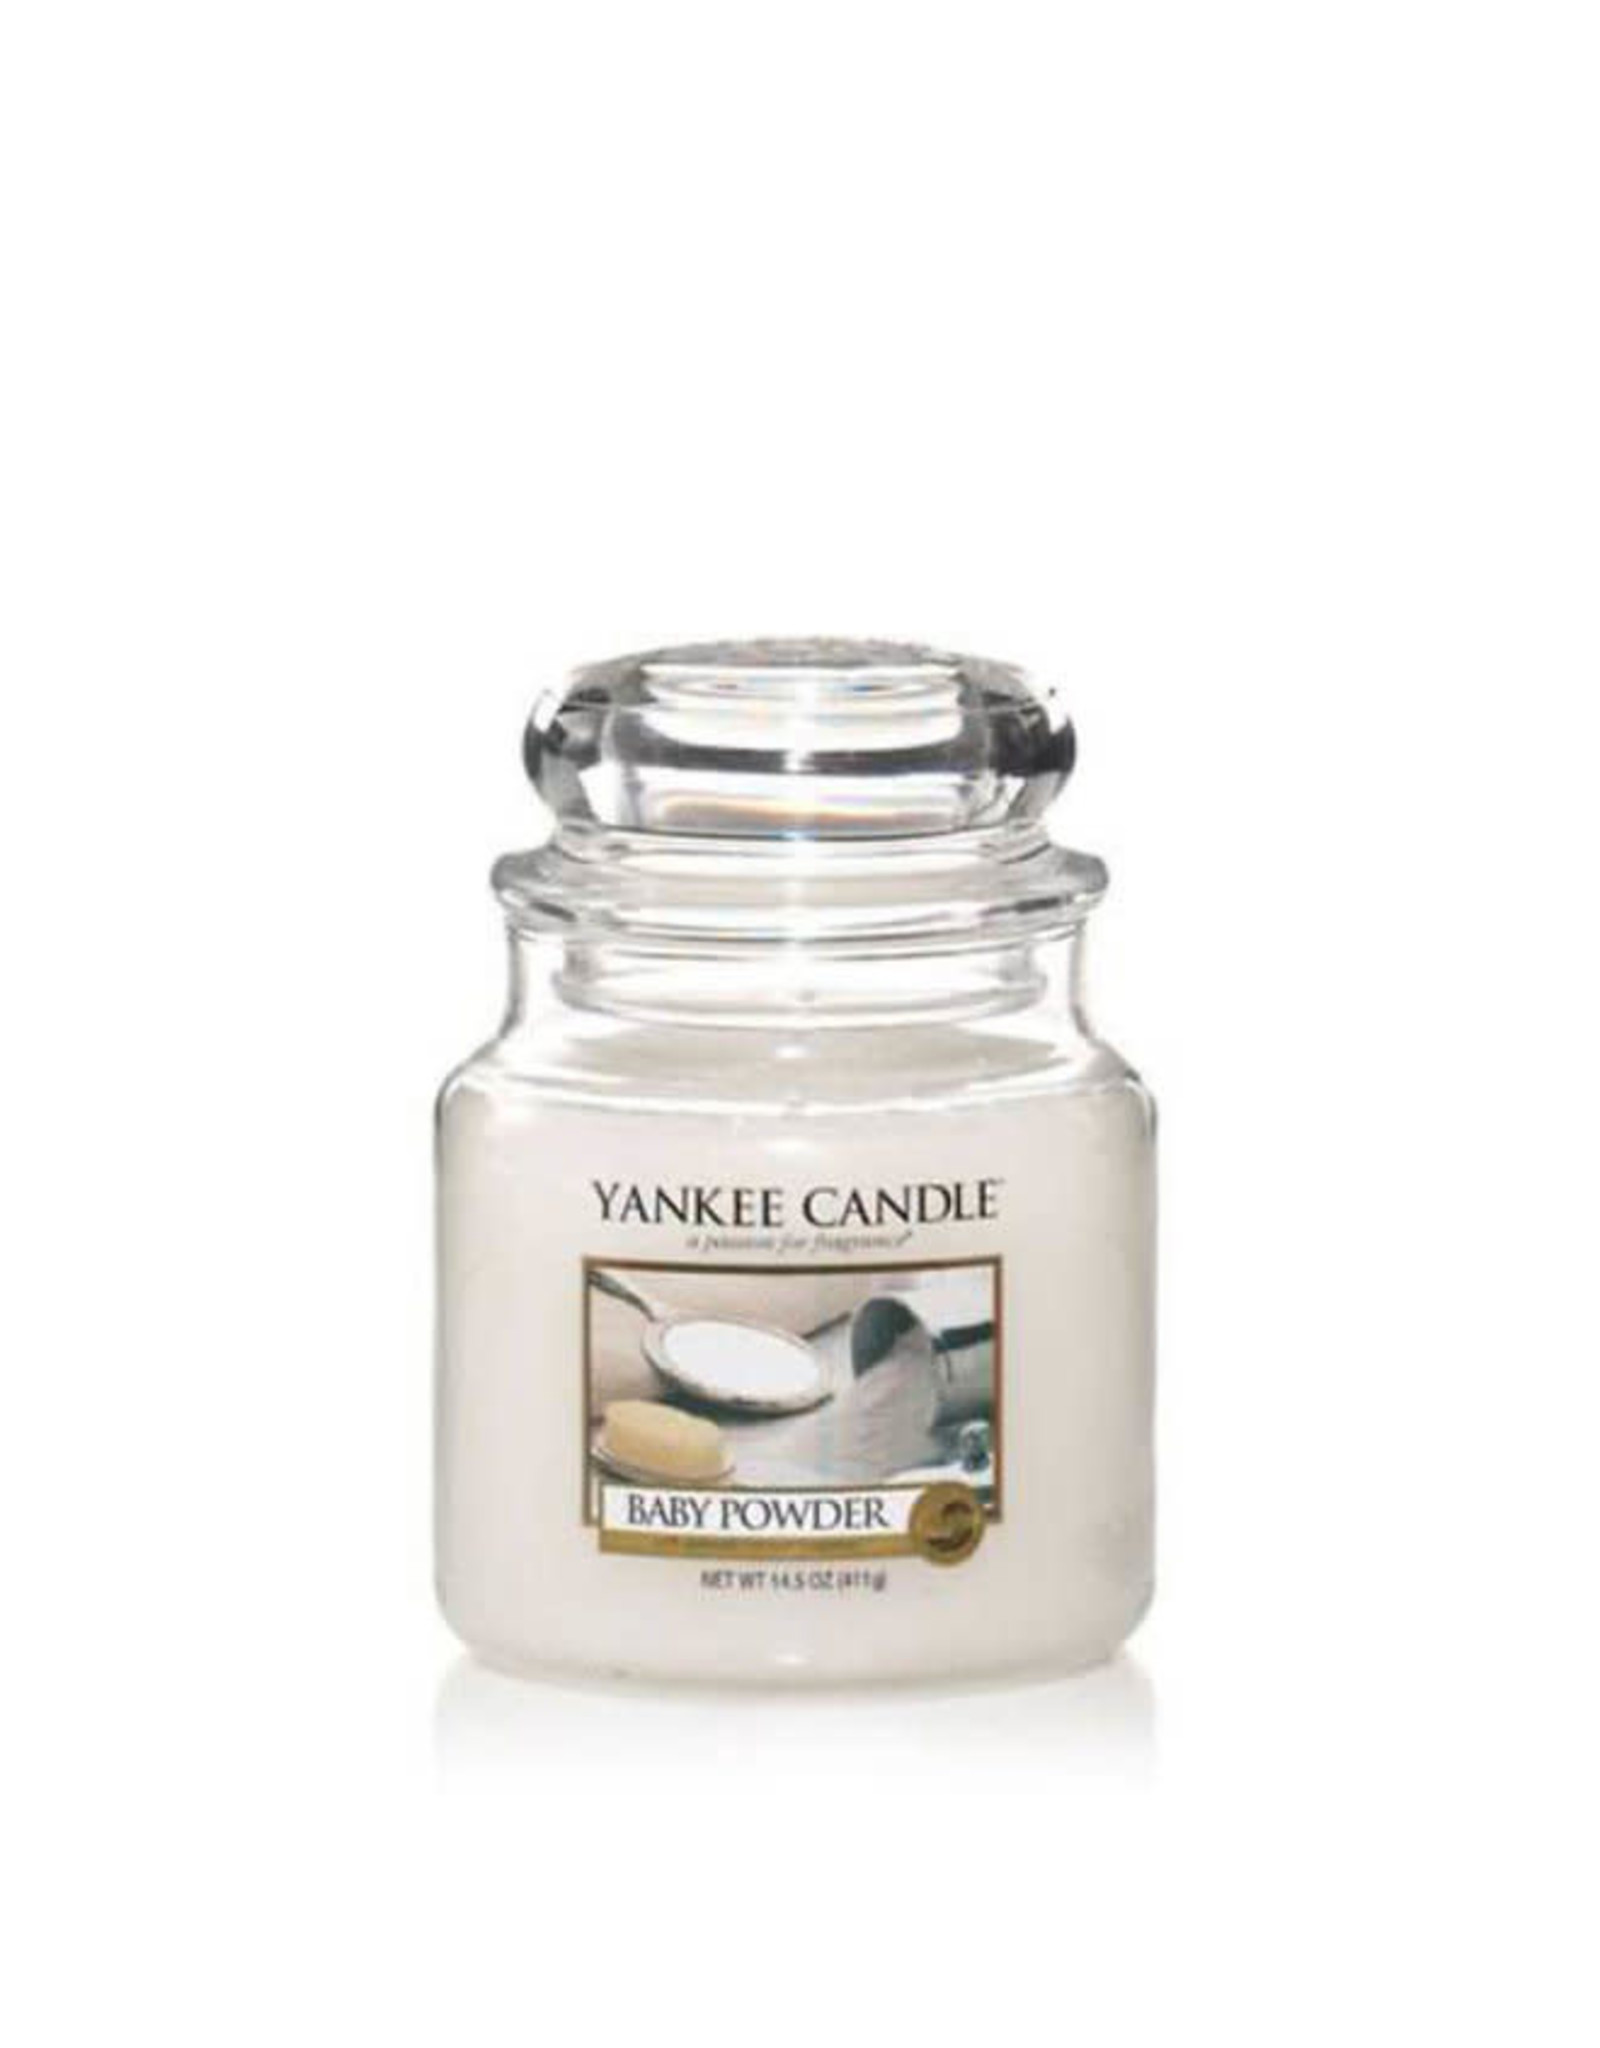 Yankee Candle Baby Powder Yankee Candle